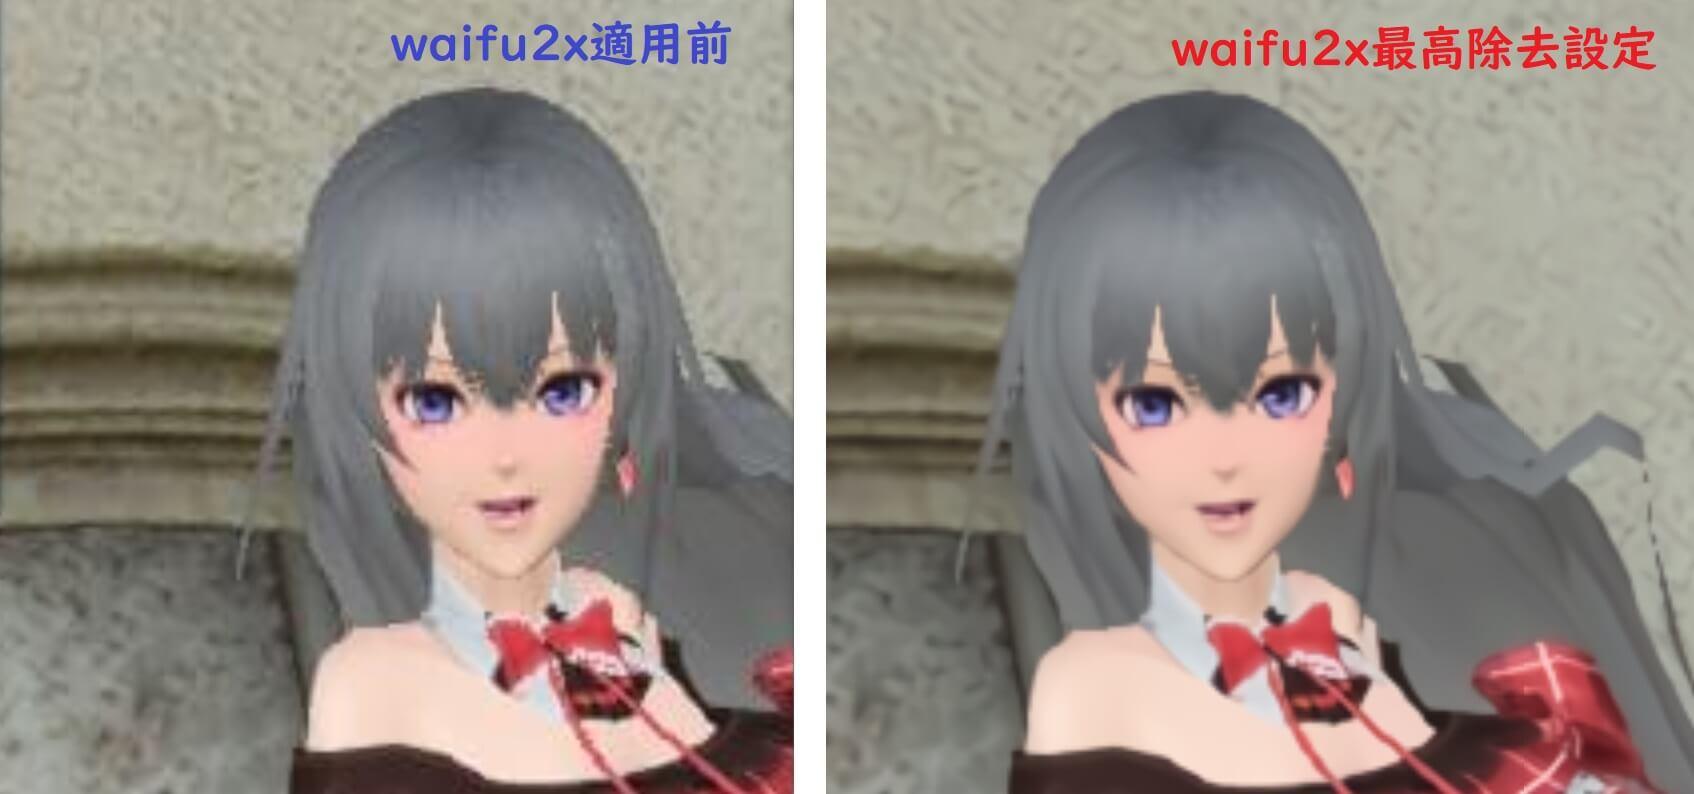 Waifu2xを使って画像を高画質化させよう Baskmedia